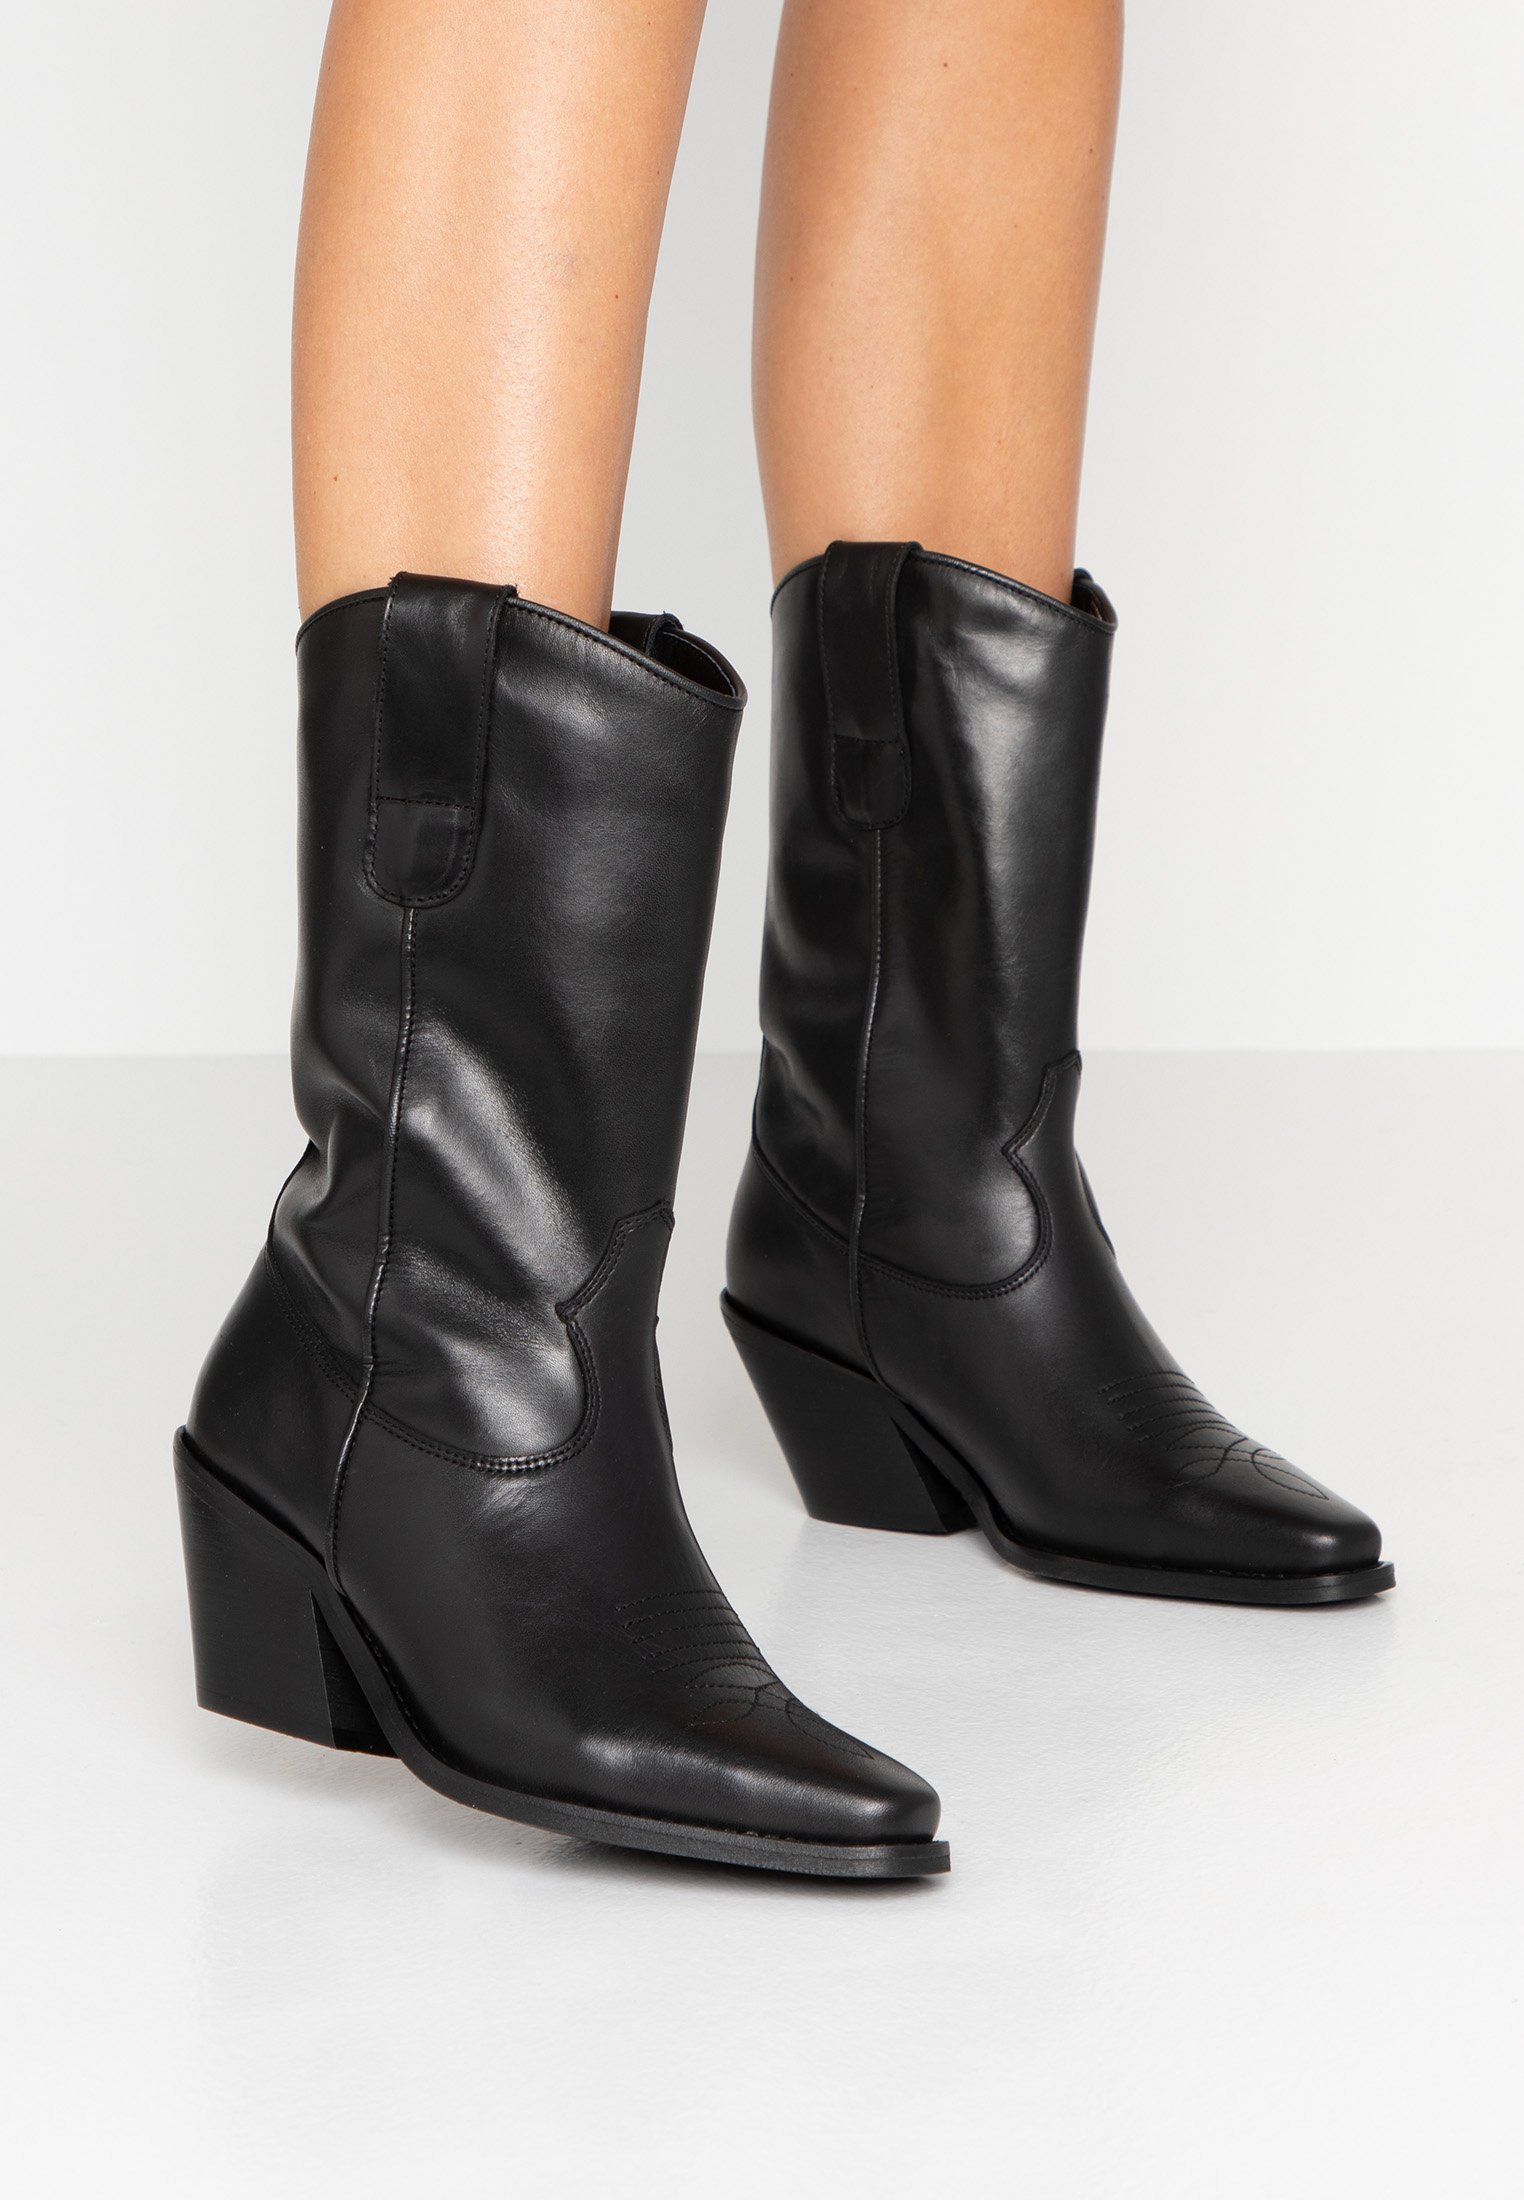 Stivali da donna | Zalando